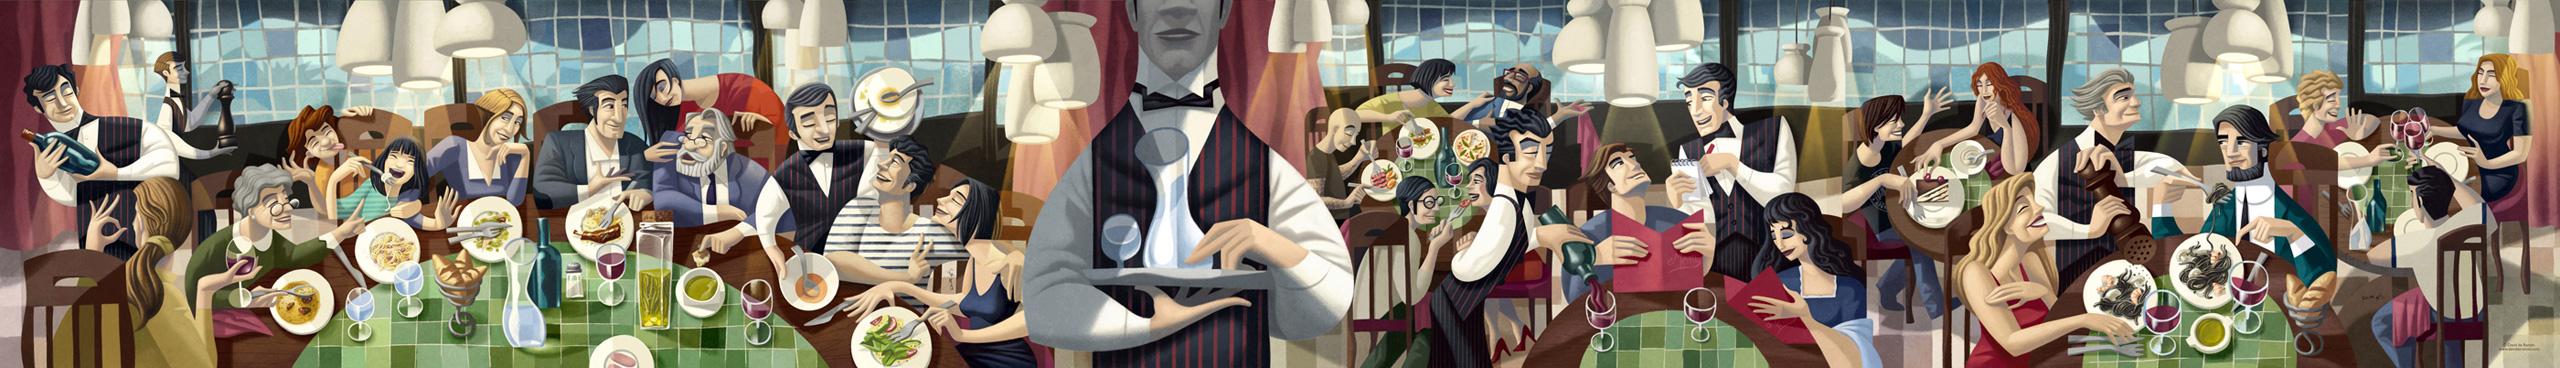 www.davidderamon.com - illustration - da nicola ristorante